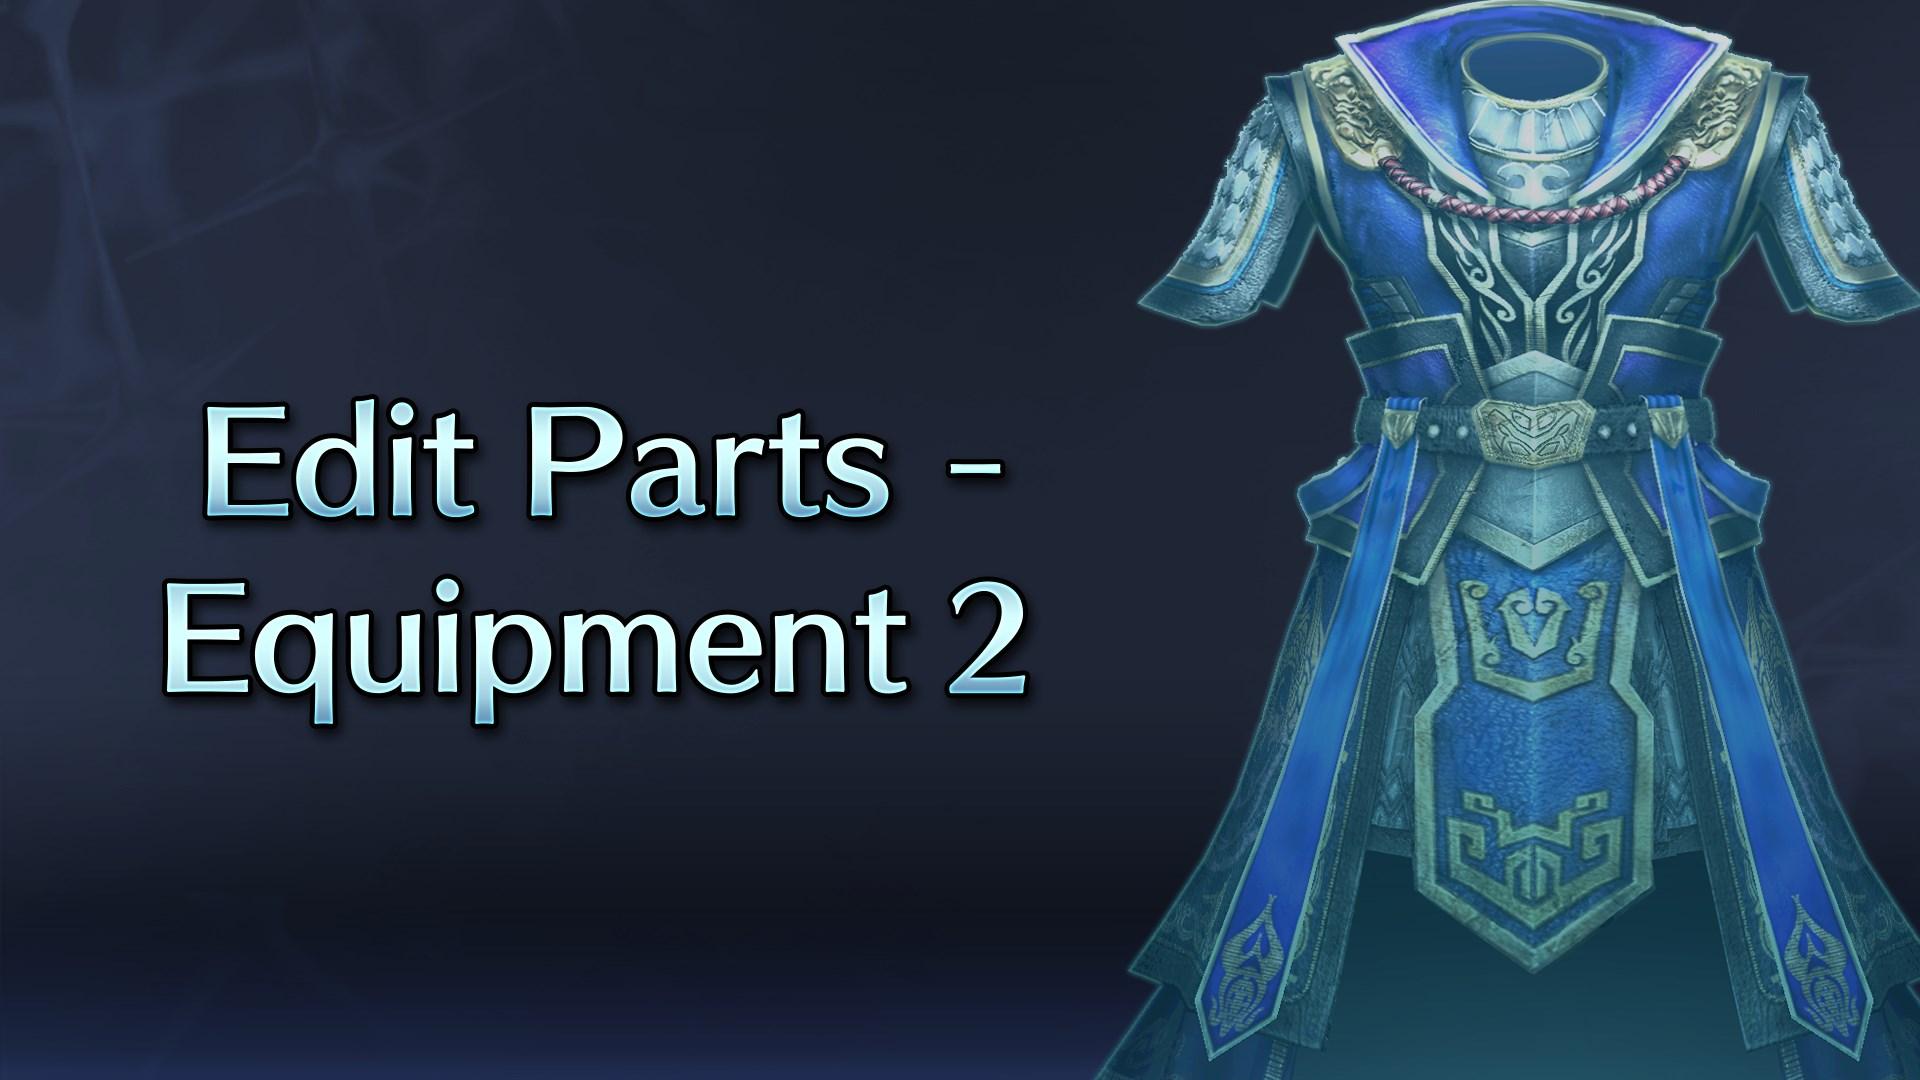 Edit Parts - Equipment 2